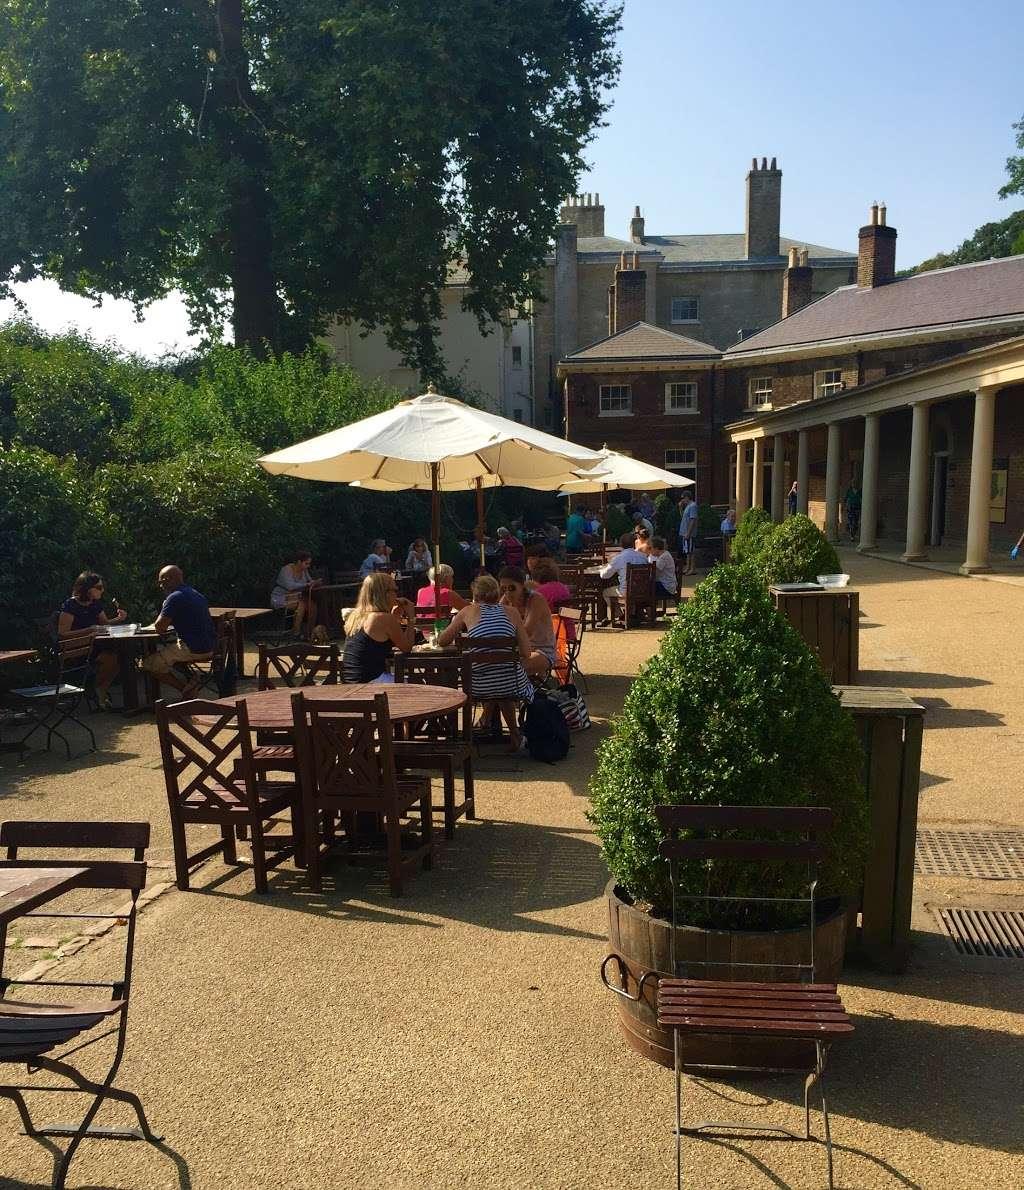 The Brew House - cafe    Photo 5 of 10   Address: Kenwood House, Hampstead Ln, Highgate, London NW3 7JR, UK   Phone: 020 8348 4073